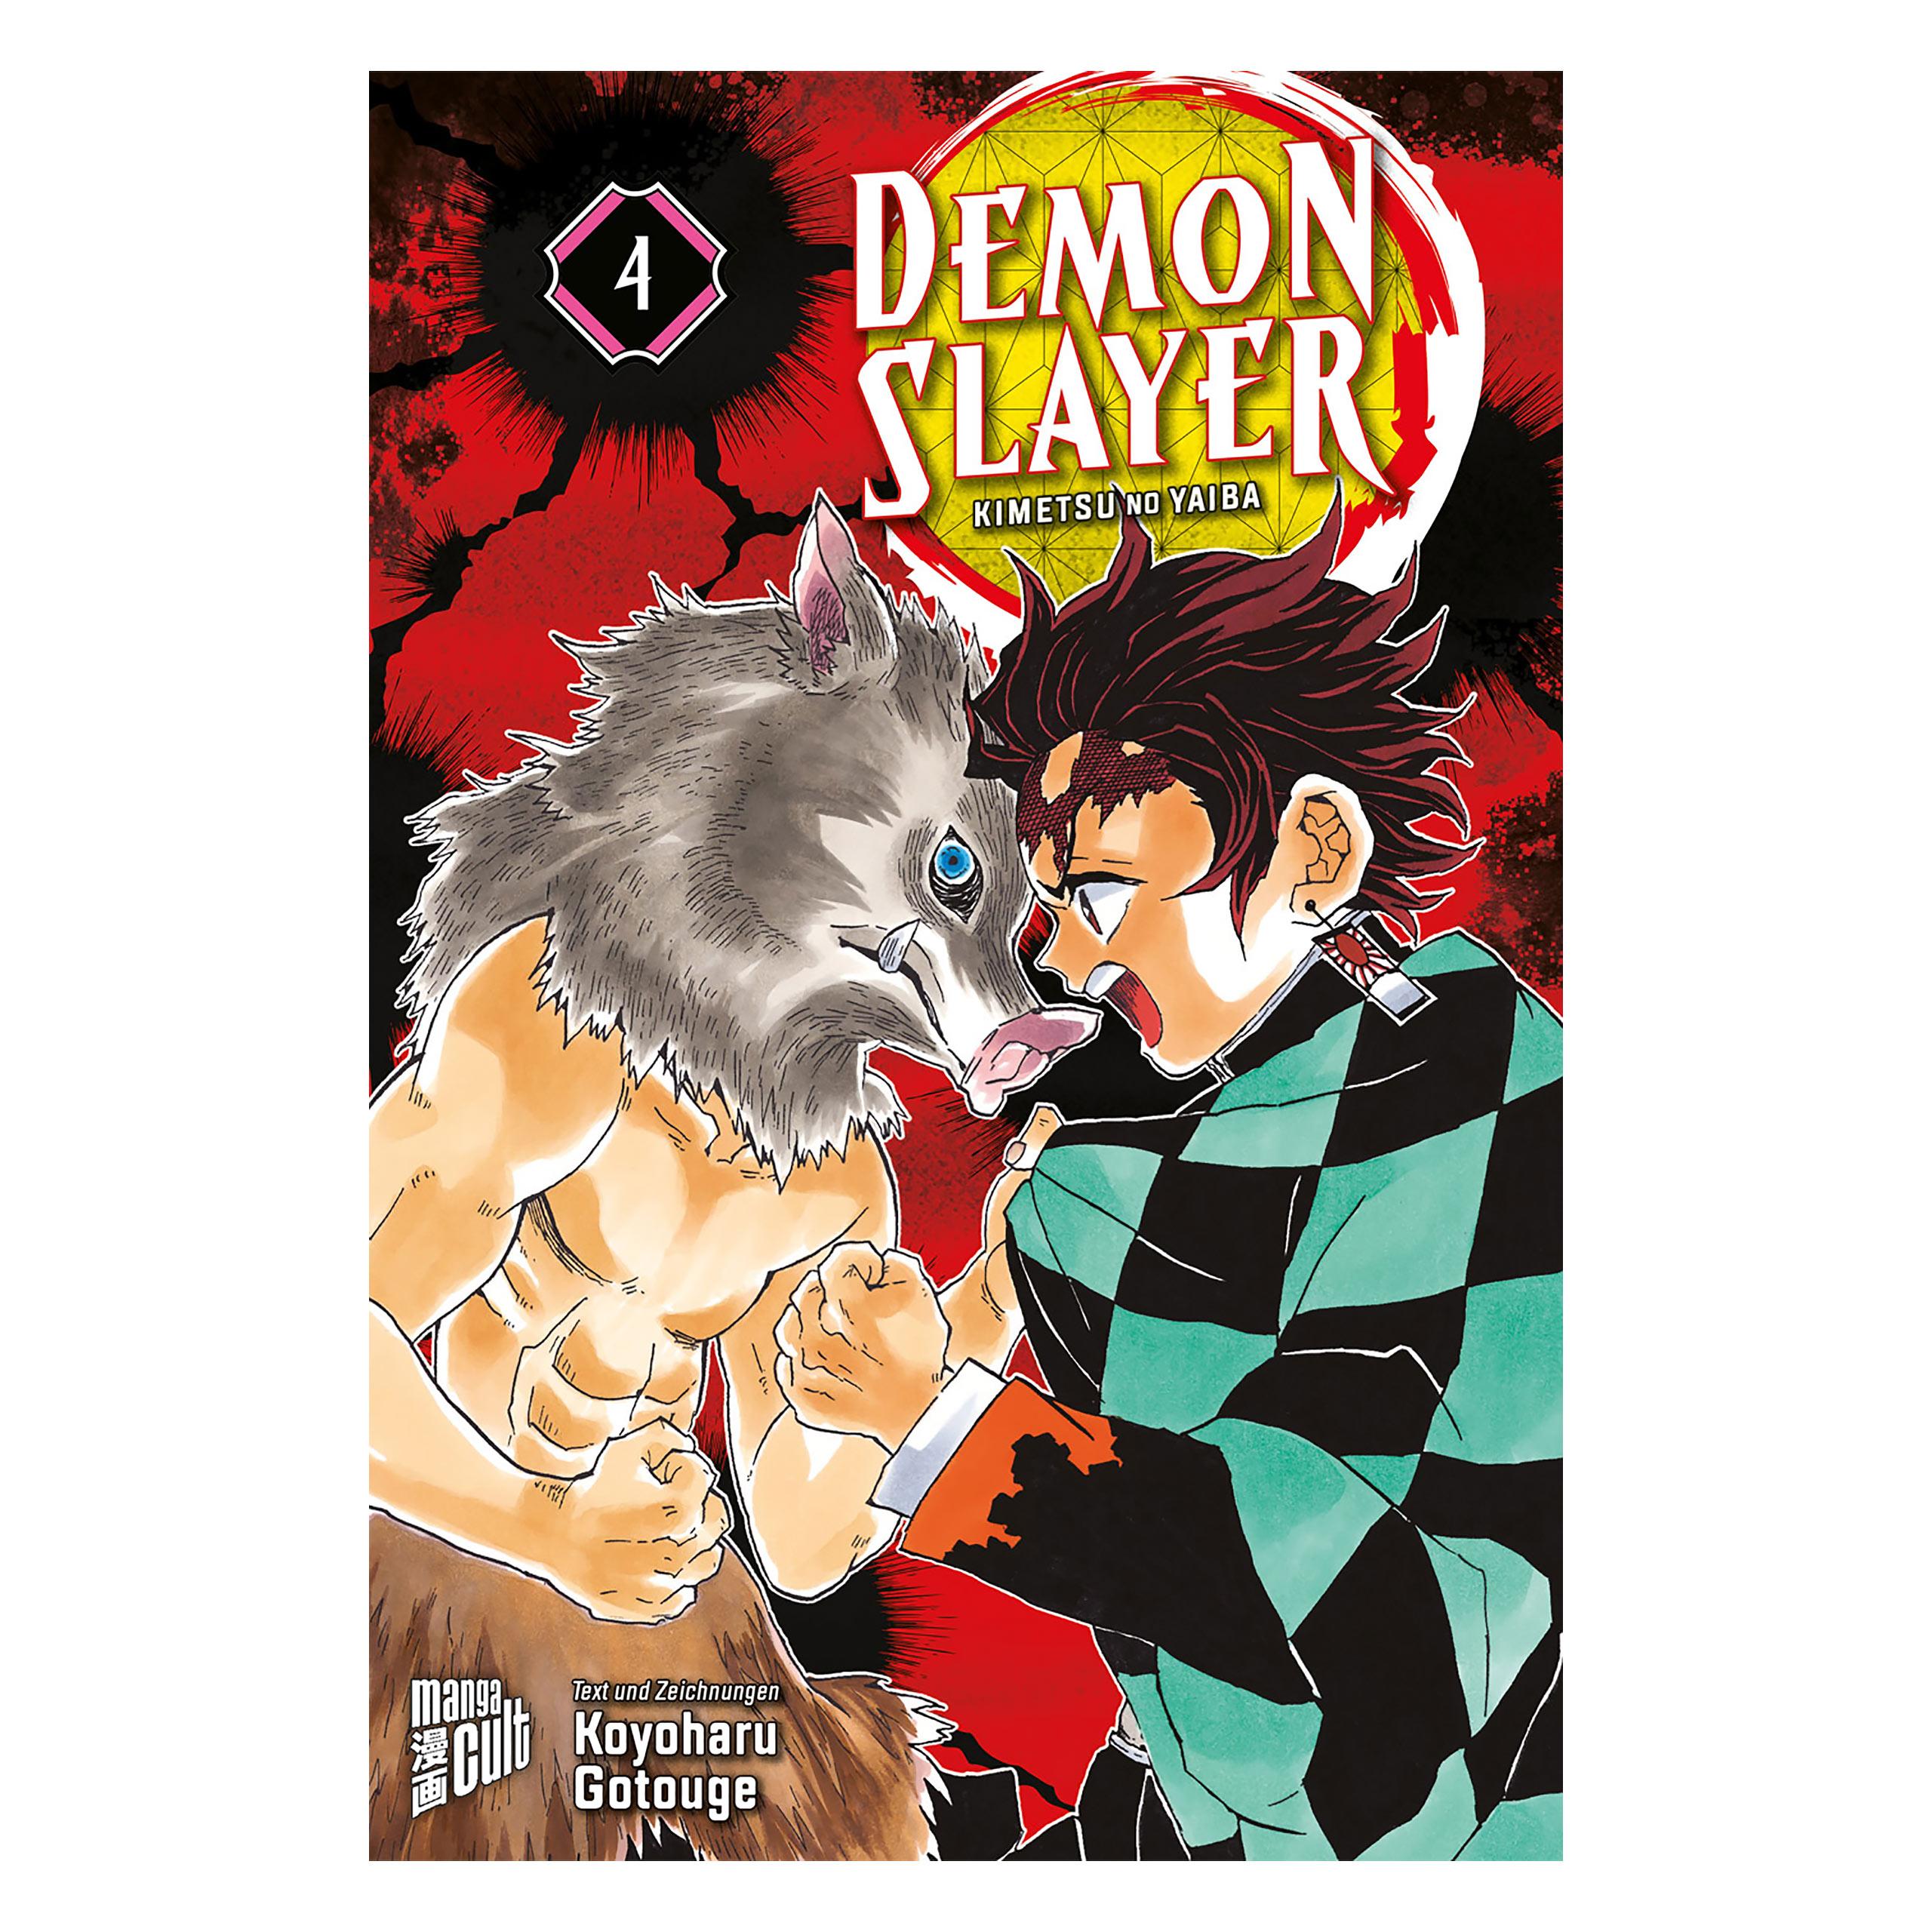 Demon Slayer - Kimetsu no yaiba Band 4 Taschenbuch